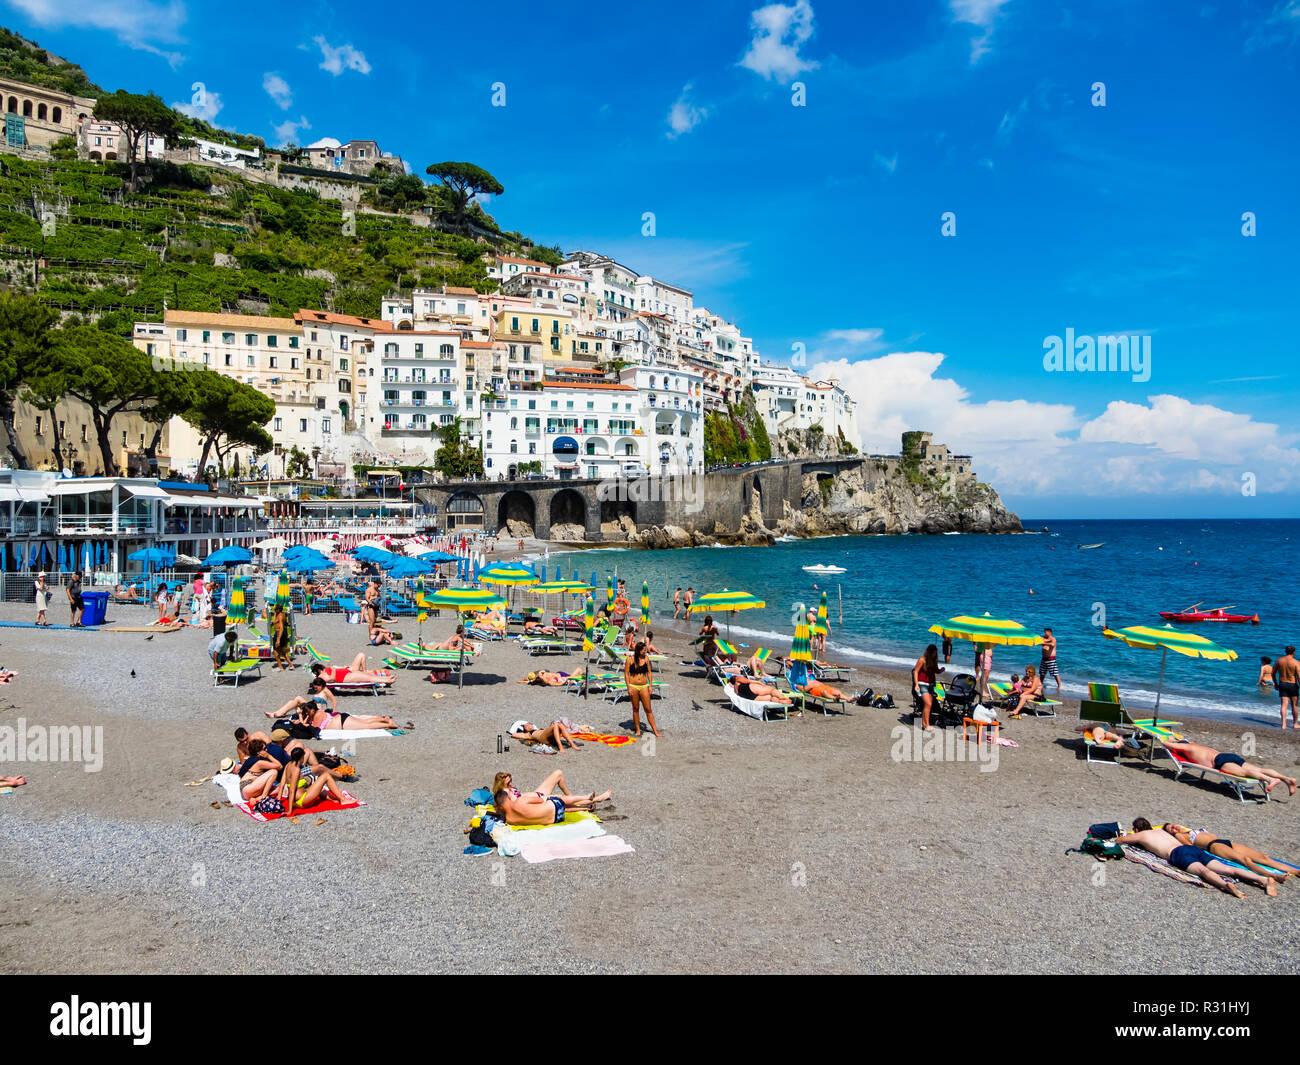 Altstadt und Strand von Amalfi, Amalfi, Halbinsel von Sorrent, Amalfiküste, Kampanien, Italien - Stock Image